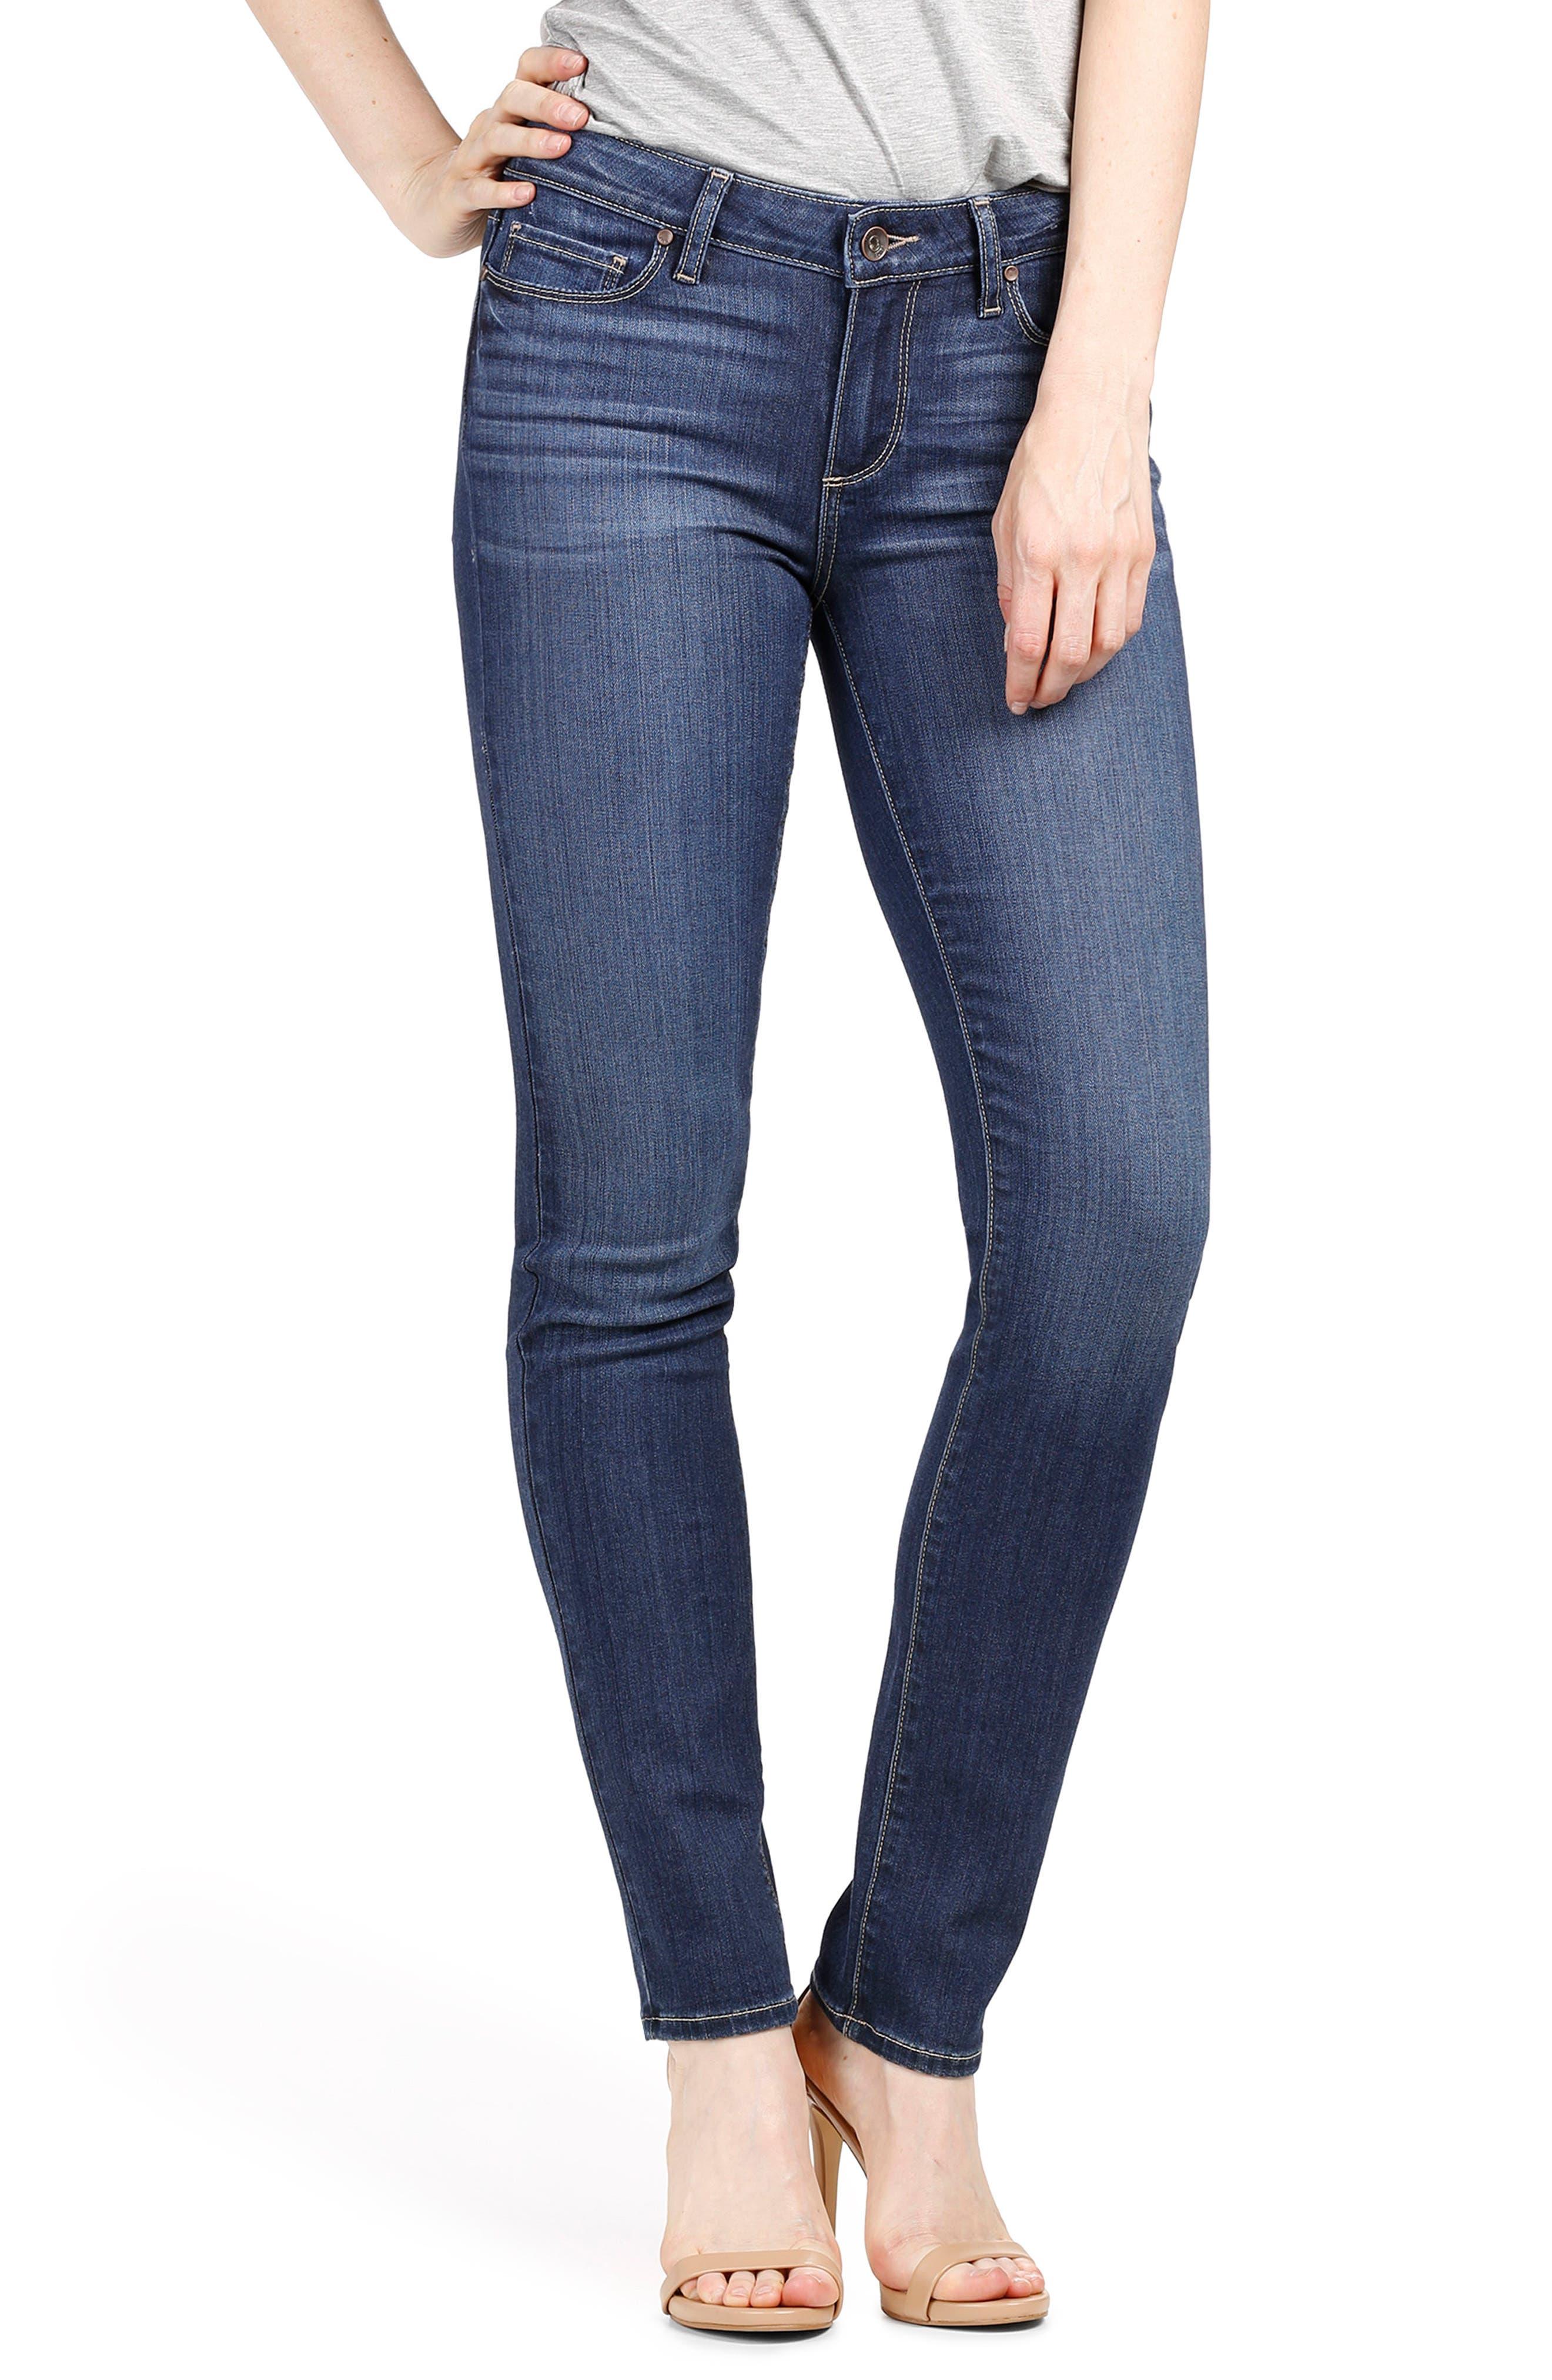 Transcend - Skyline Skinny Jeans,                         Main,                         color, 400